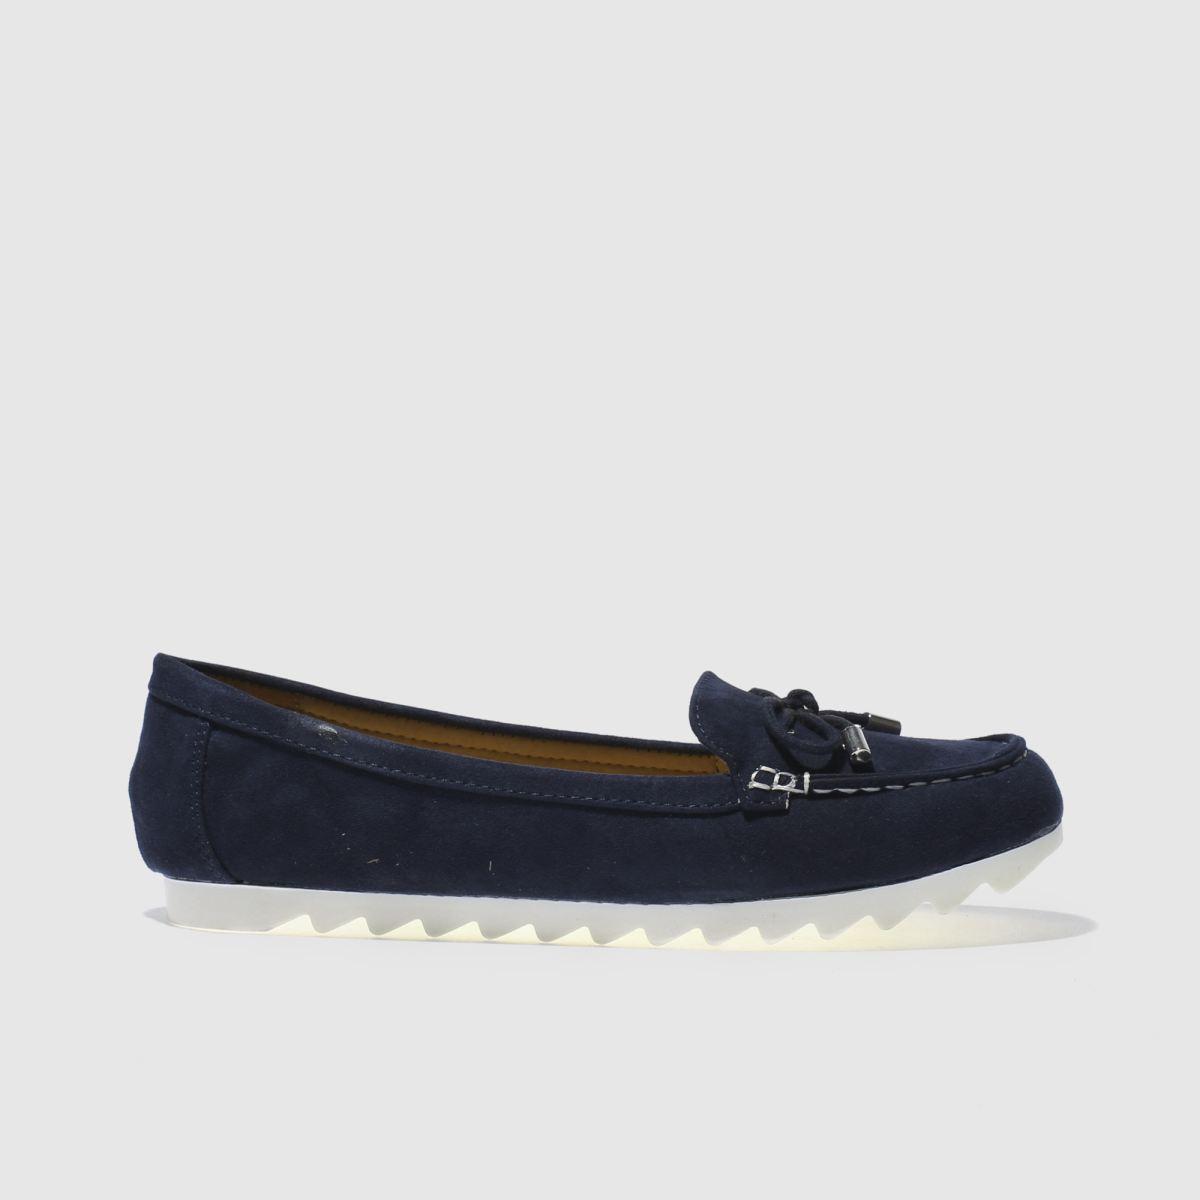 schuh Schuh Navy Jetsetter Flat Shoes